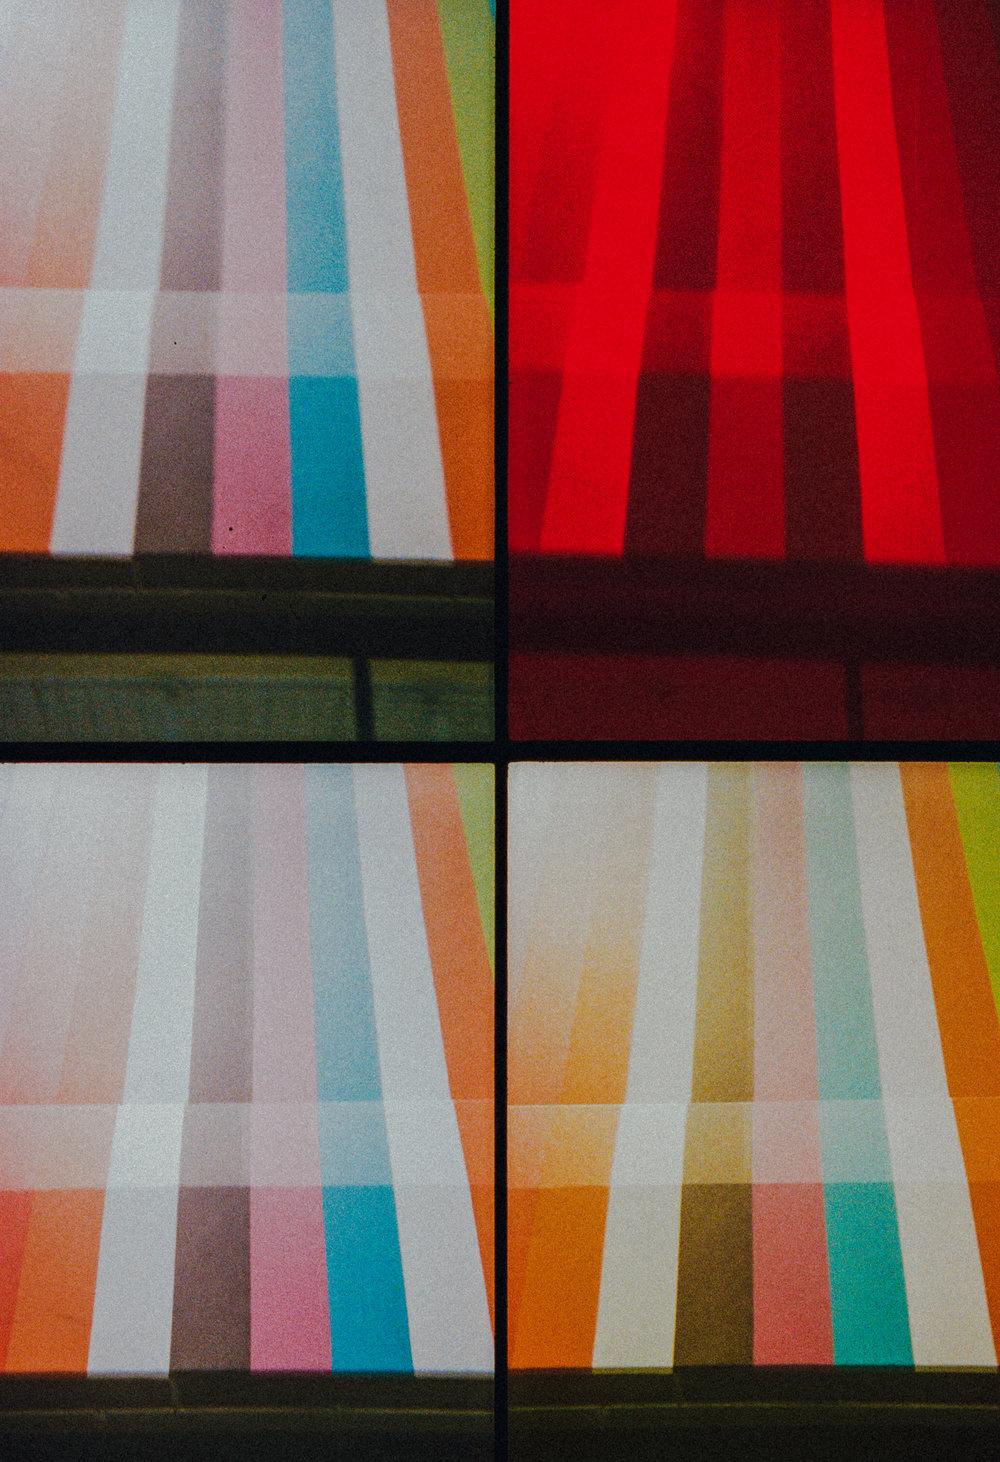 four-square-in-summerdays-2011.jpg